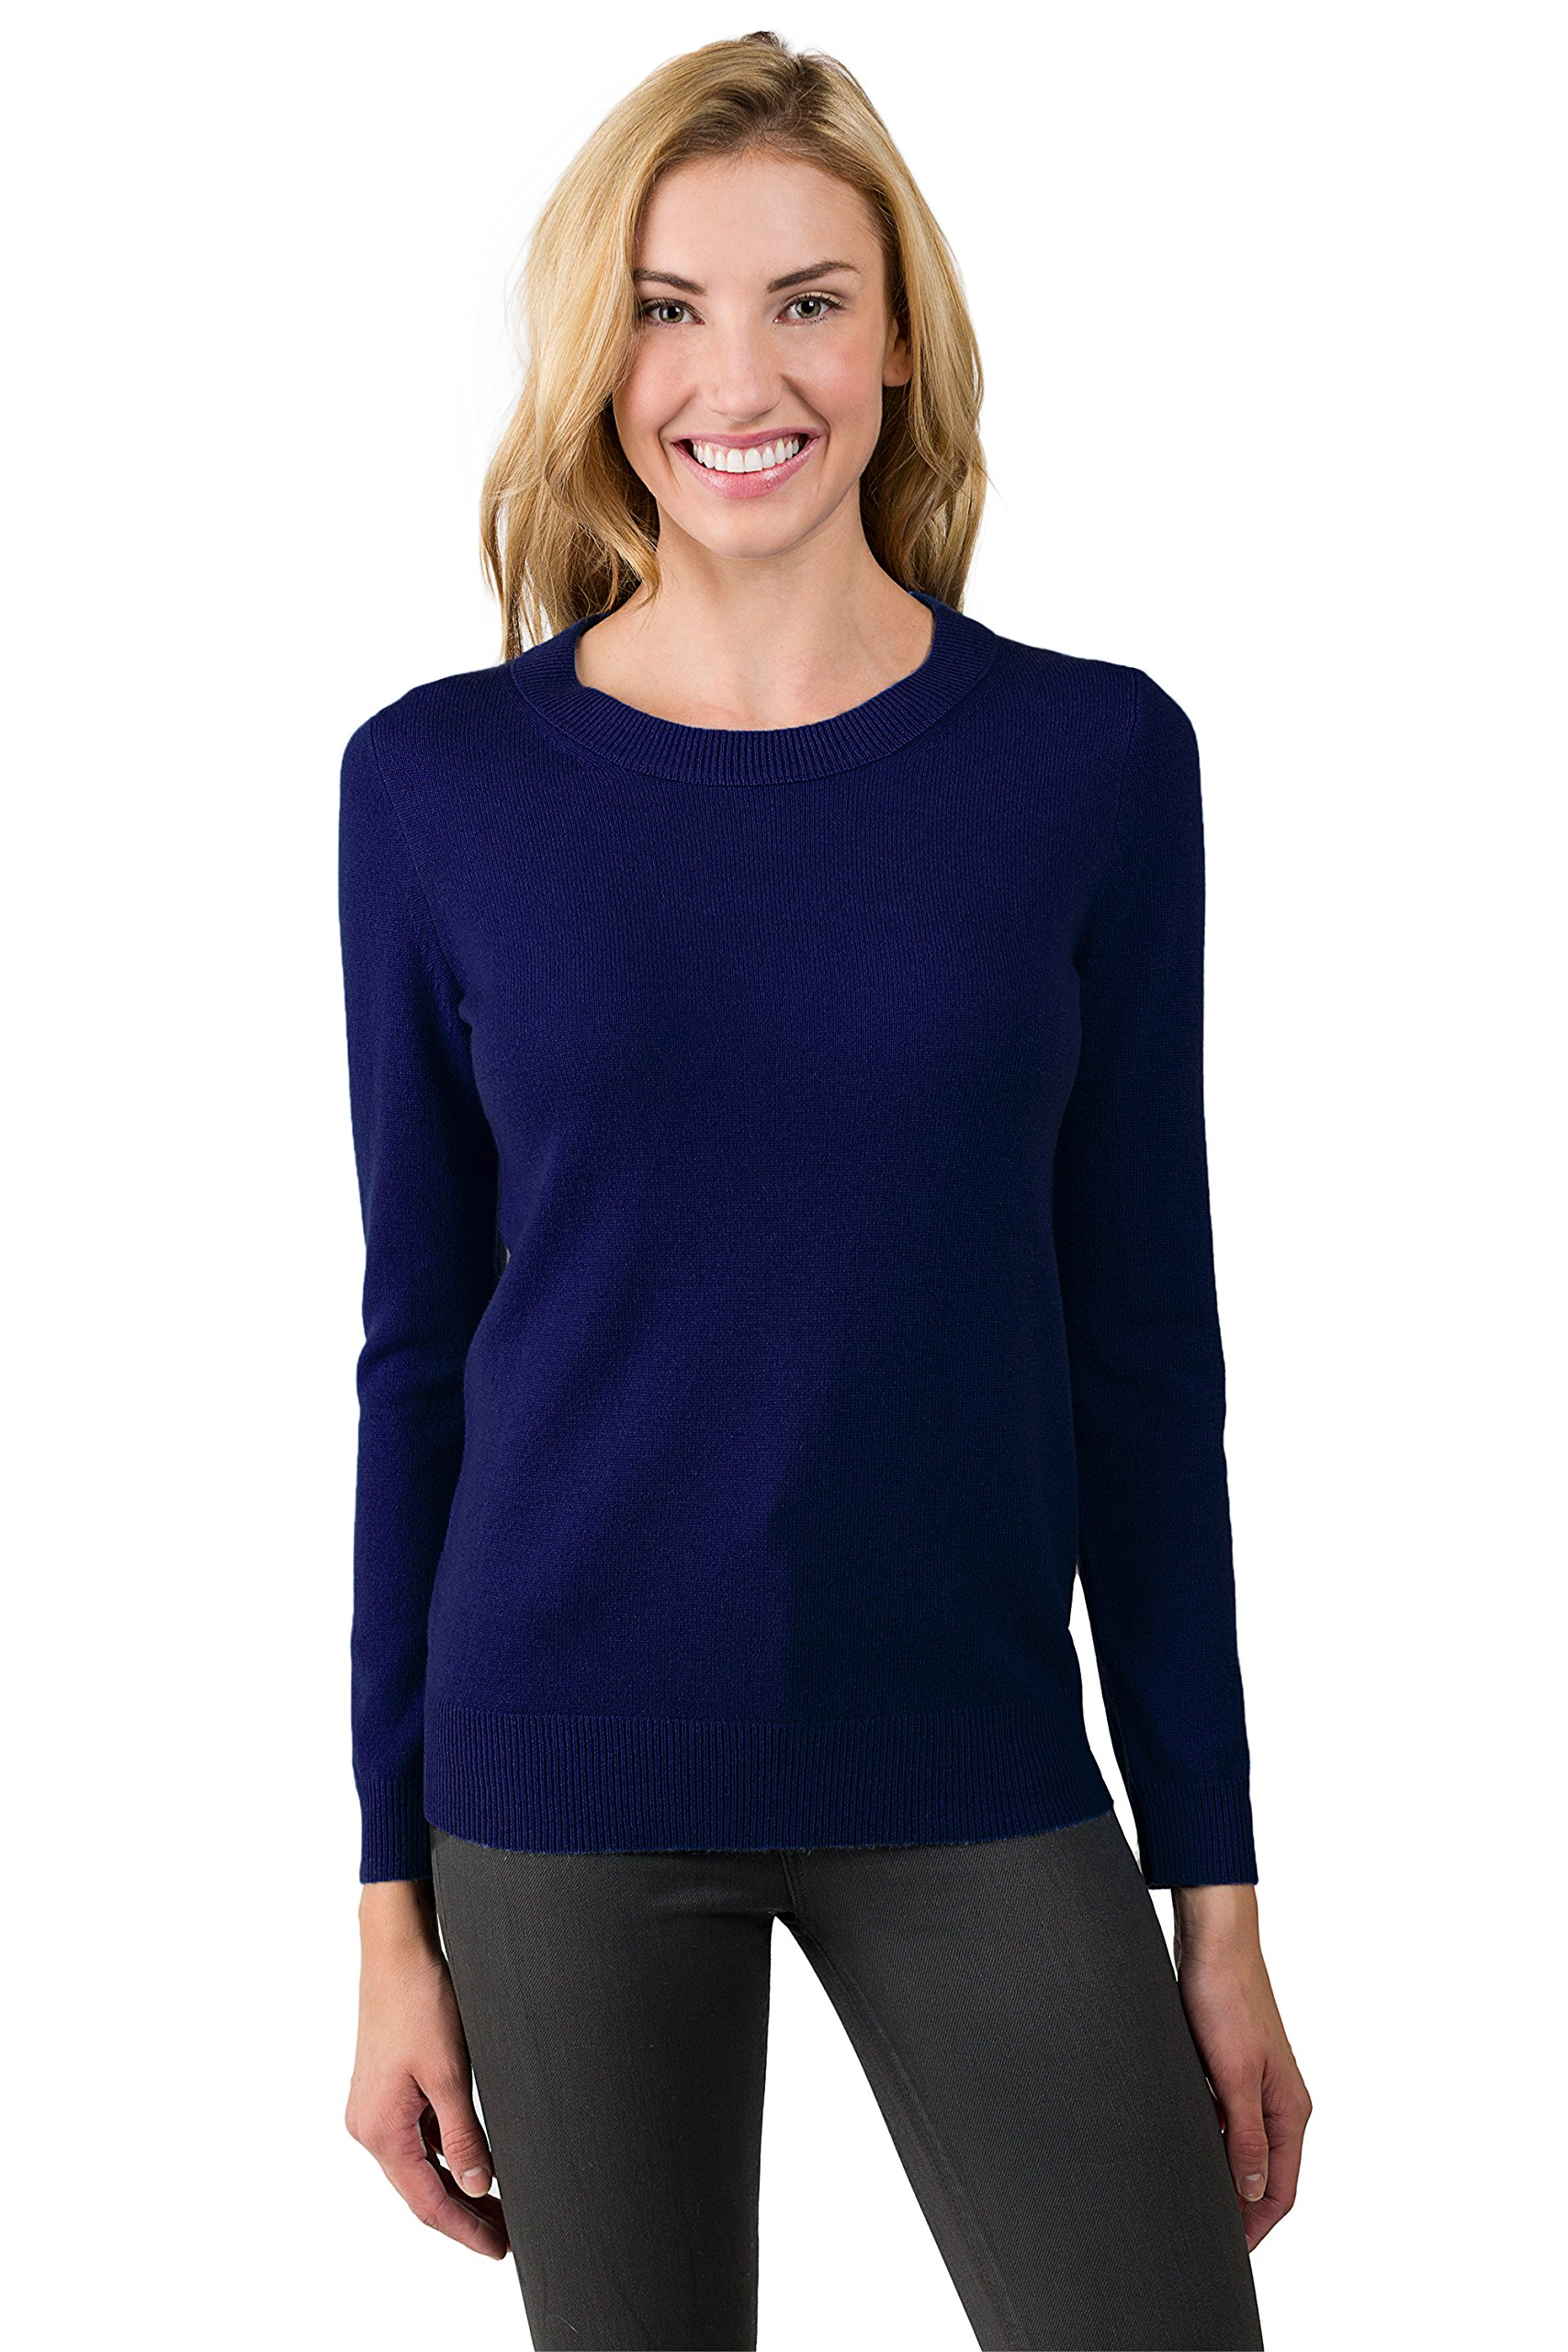 JENNIE LIU Women's 100% Pure Cashmere Long Sleeve Crew Neck Sweater (M, Midnight)